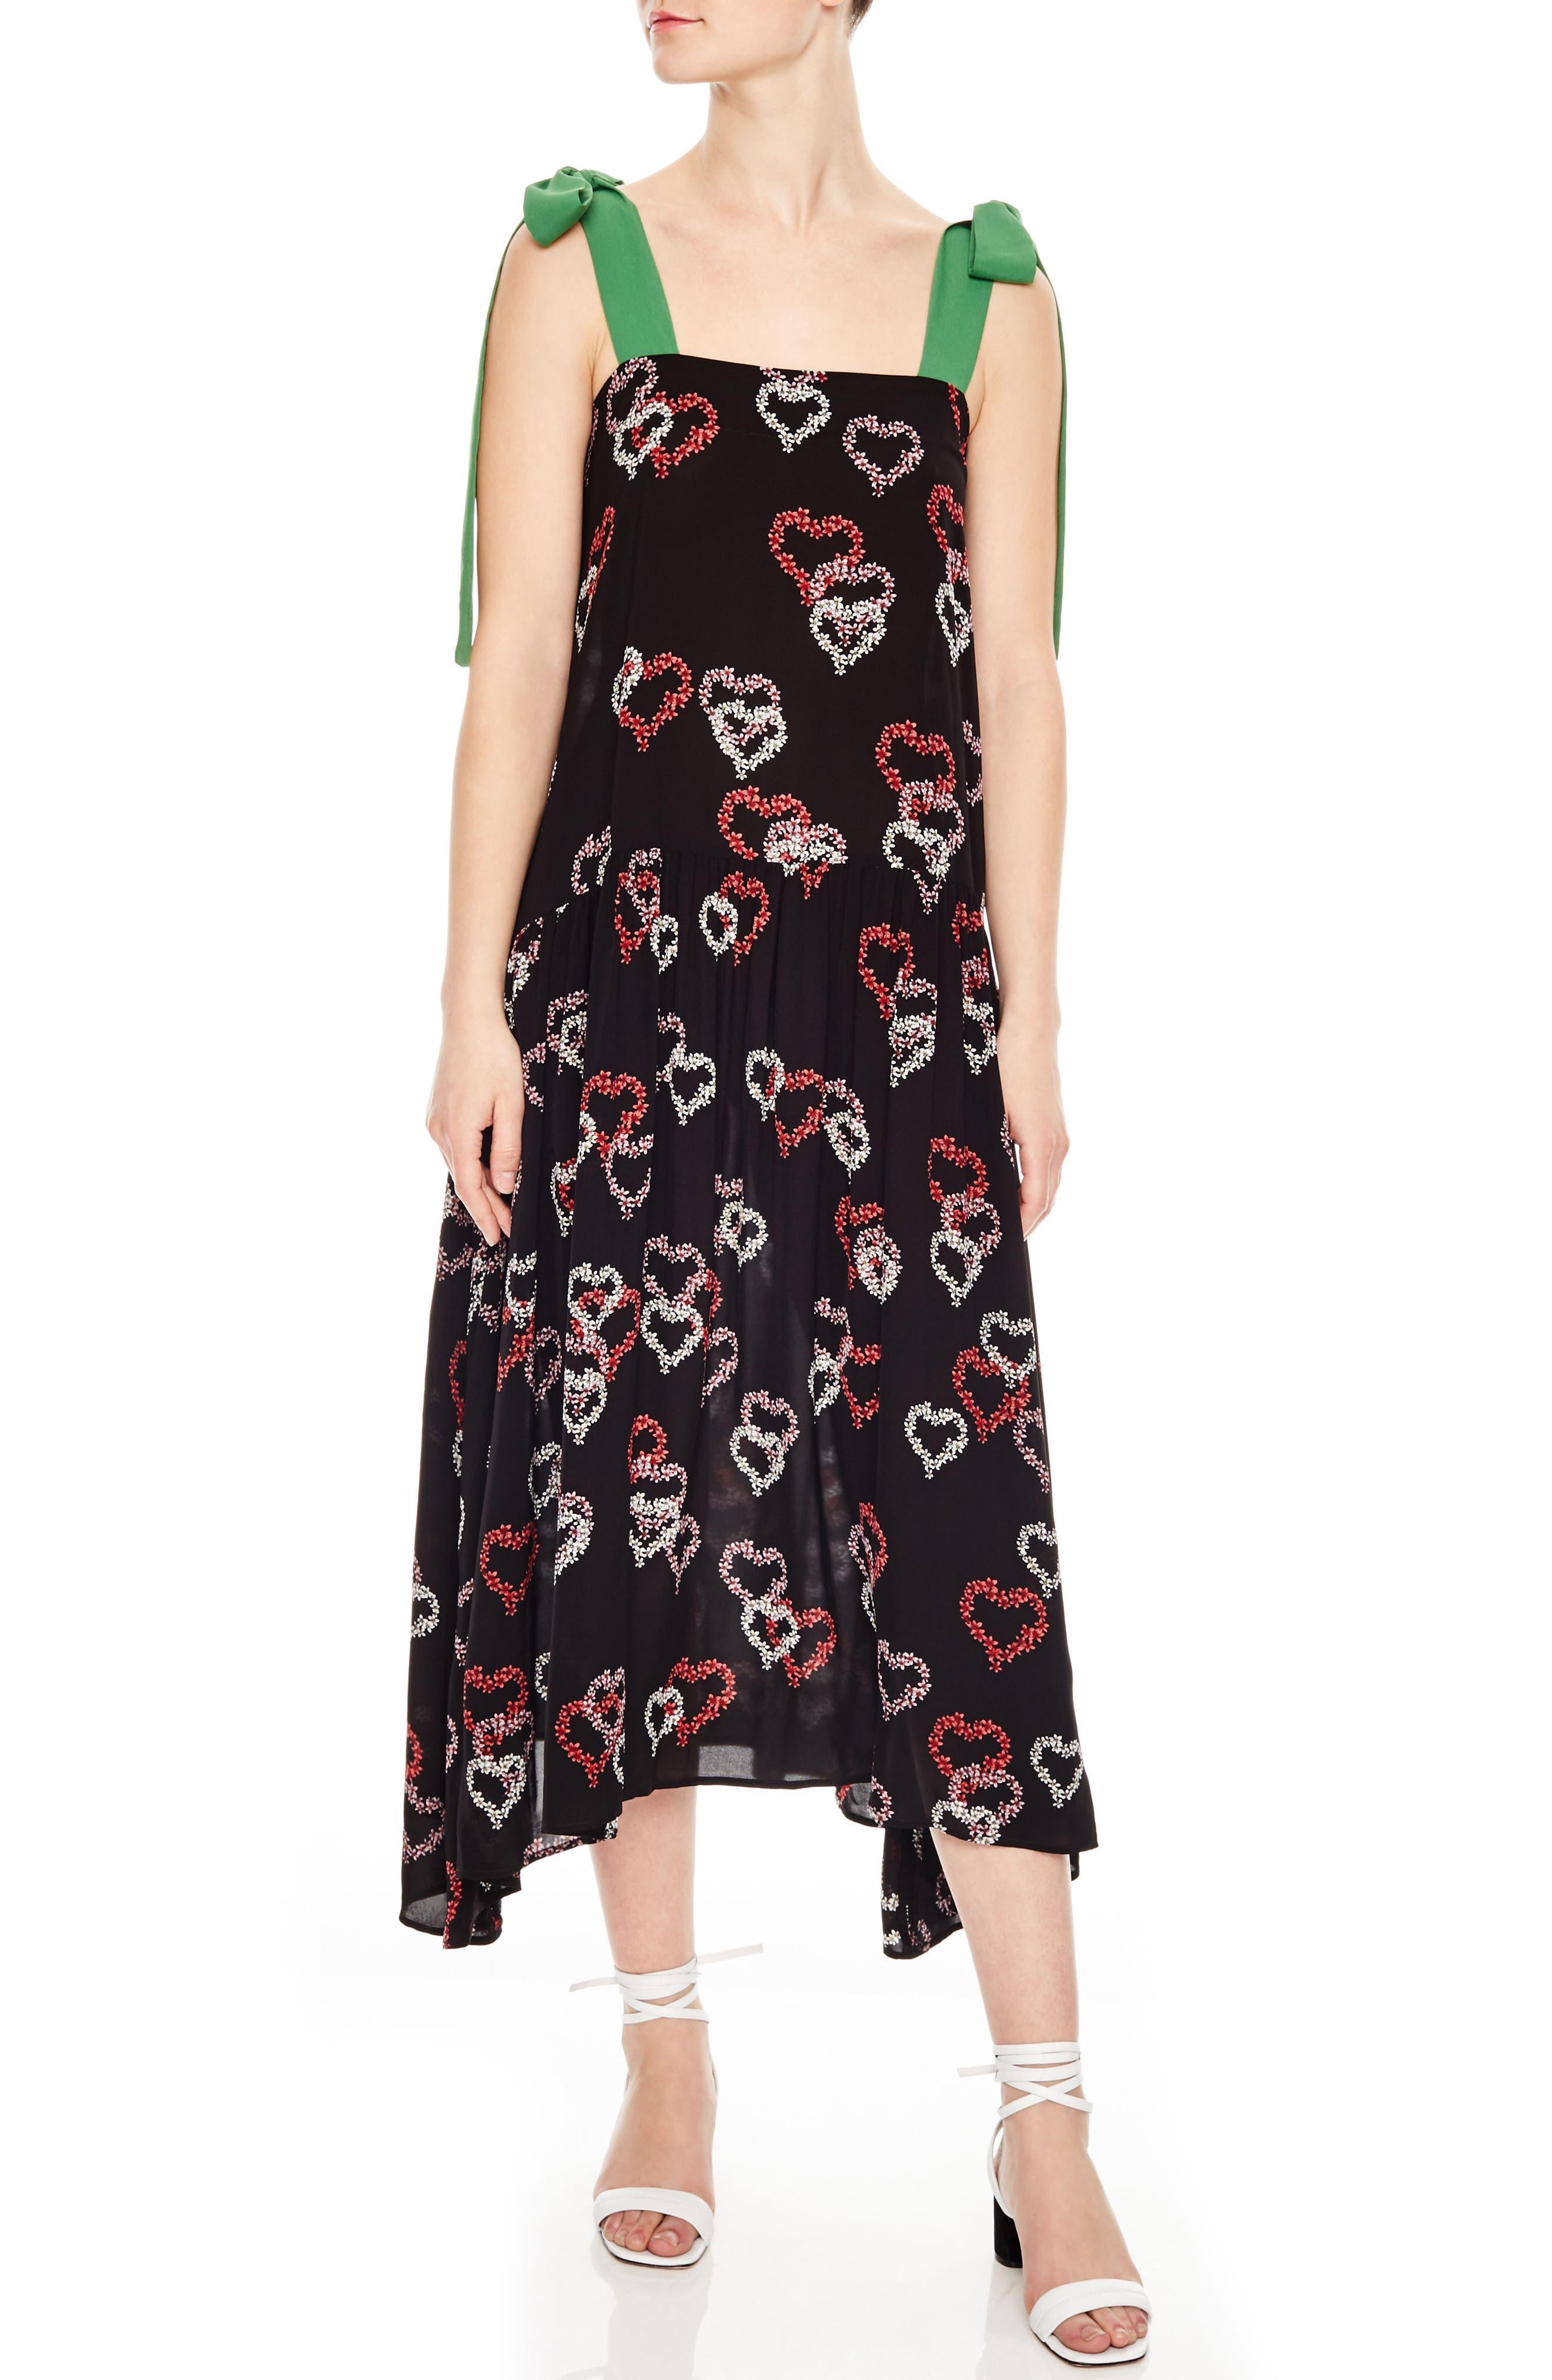 Floral Hearts Tie Strap Midi Dress,                             Main thumbnail 1, color,                             001